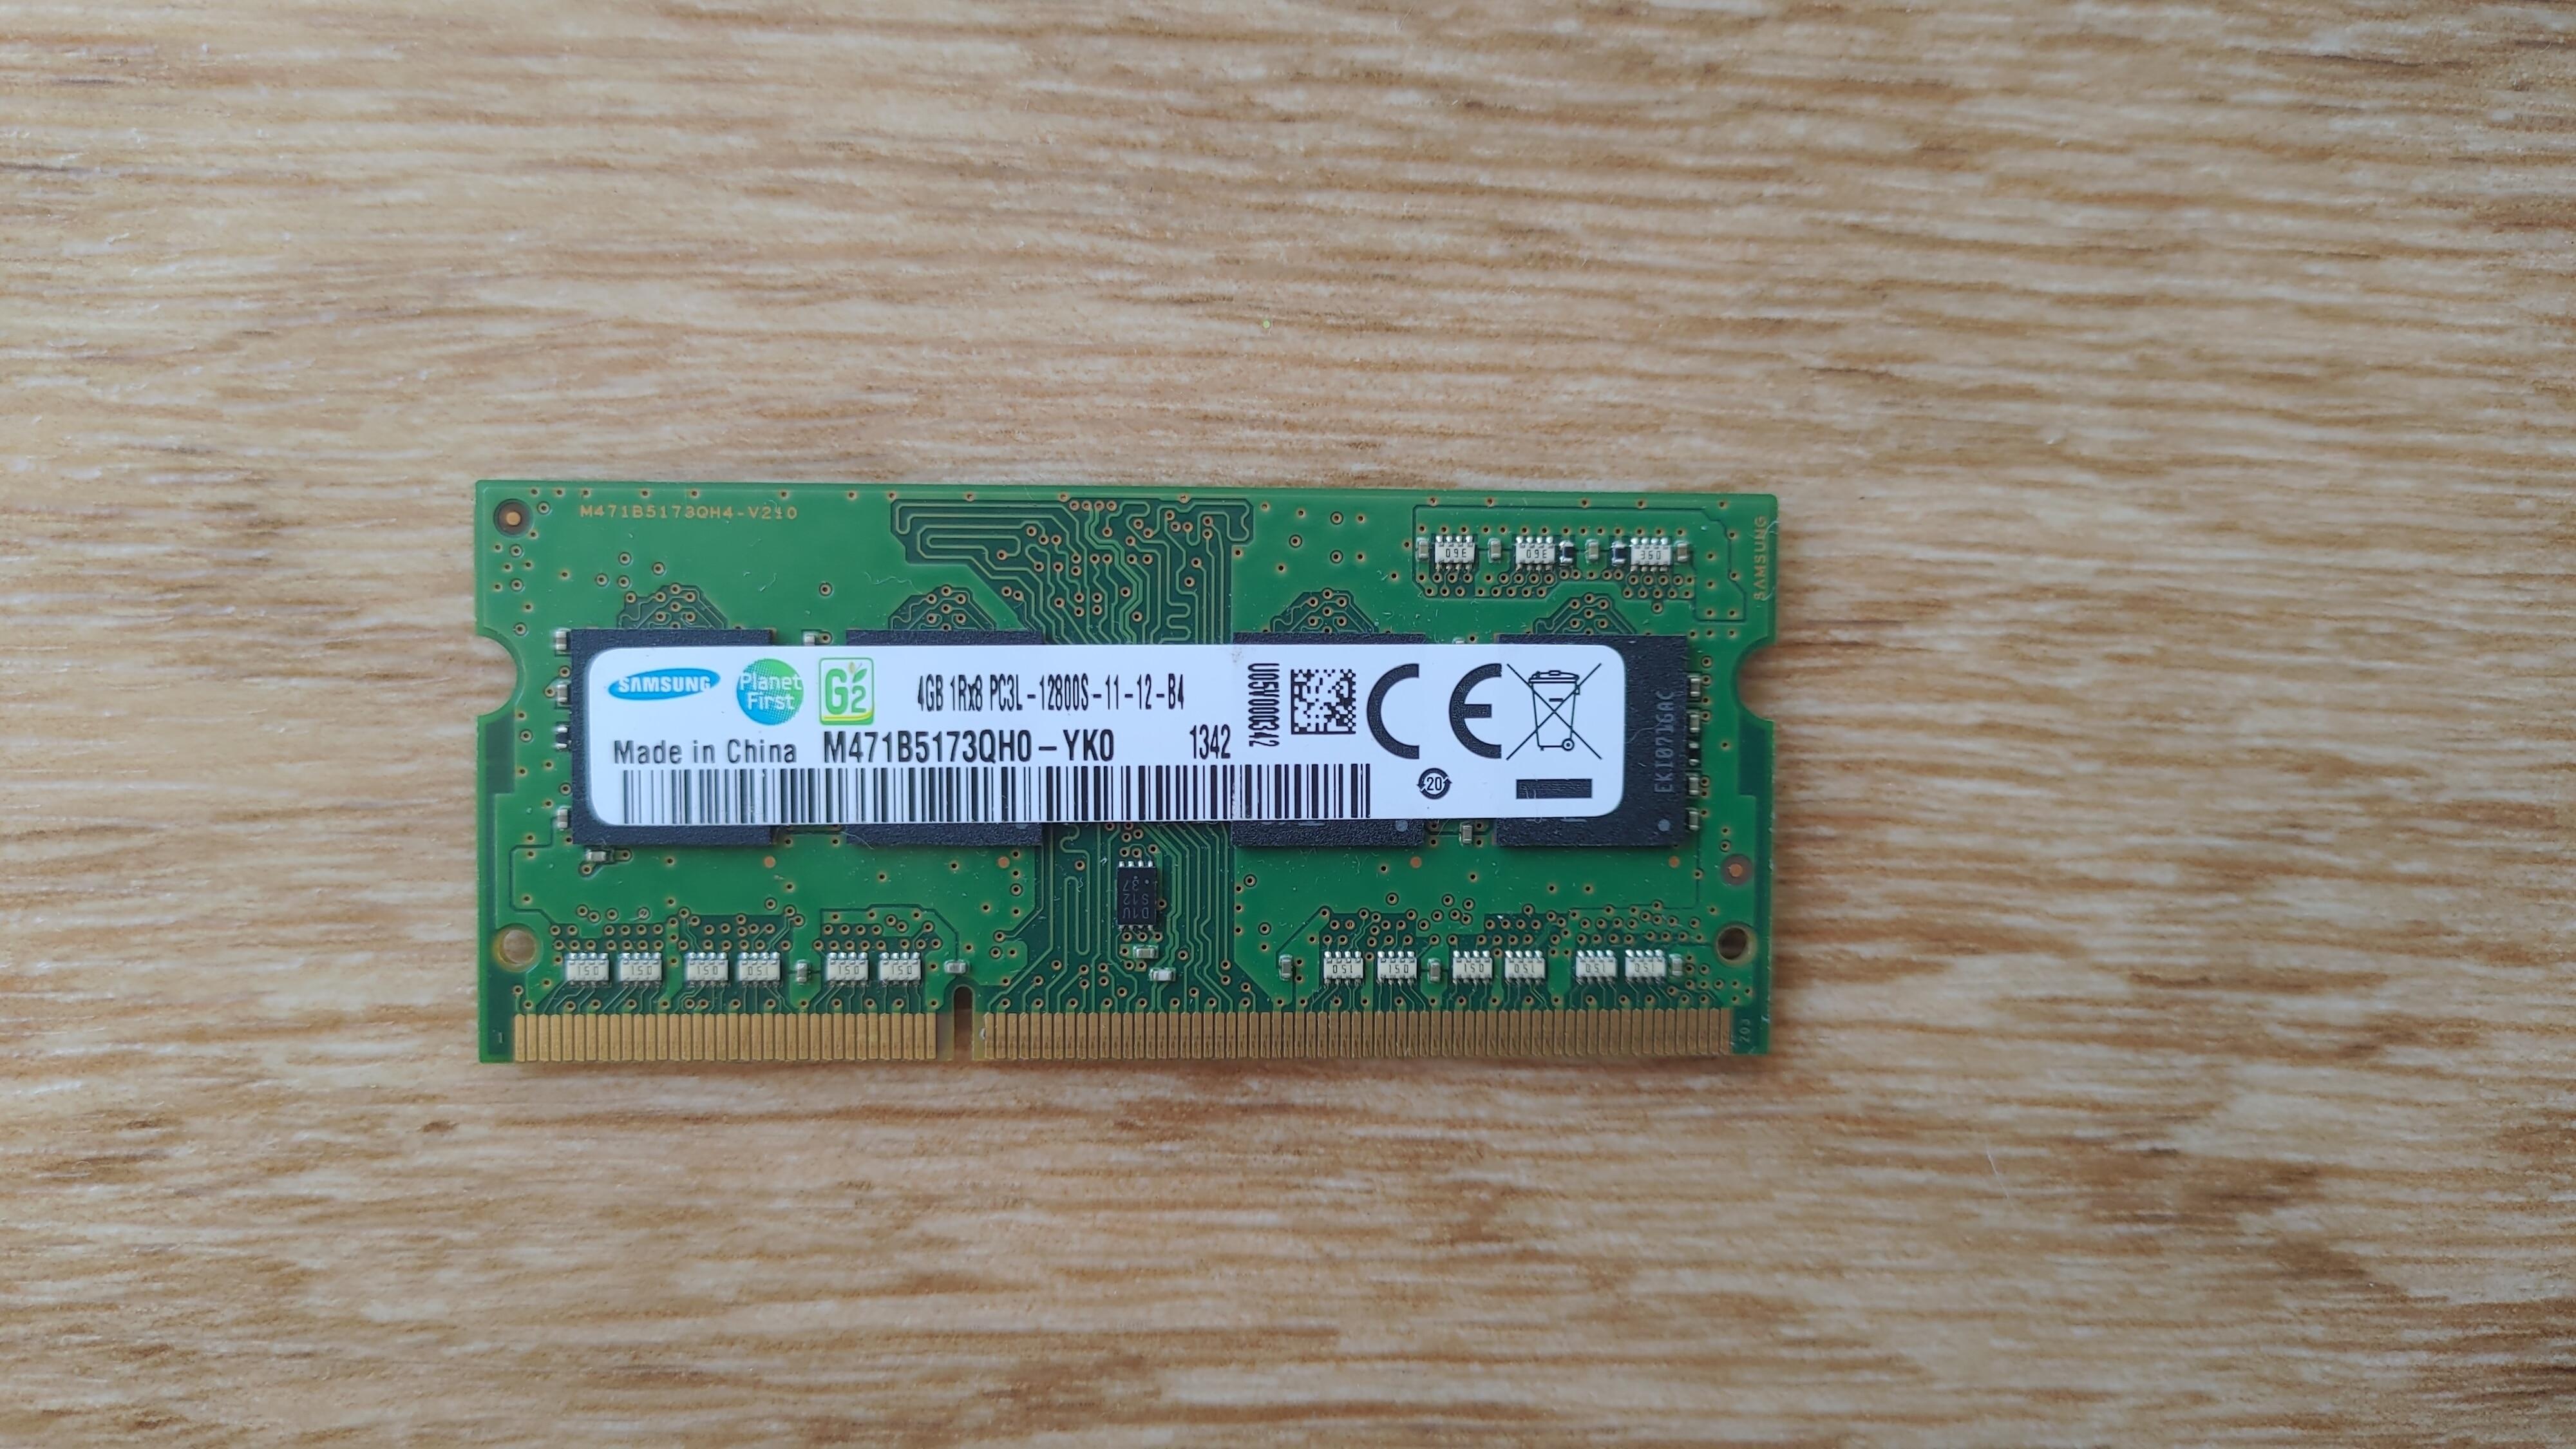 SAMSUNG 4G 1RX8 PC3L 12800S DDR3 4 Гб 1600 МГц память для ноутбука 4G PC3L 12800S 1600 МГц модуль для ноутбука SODIMM RAM